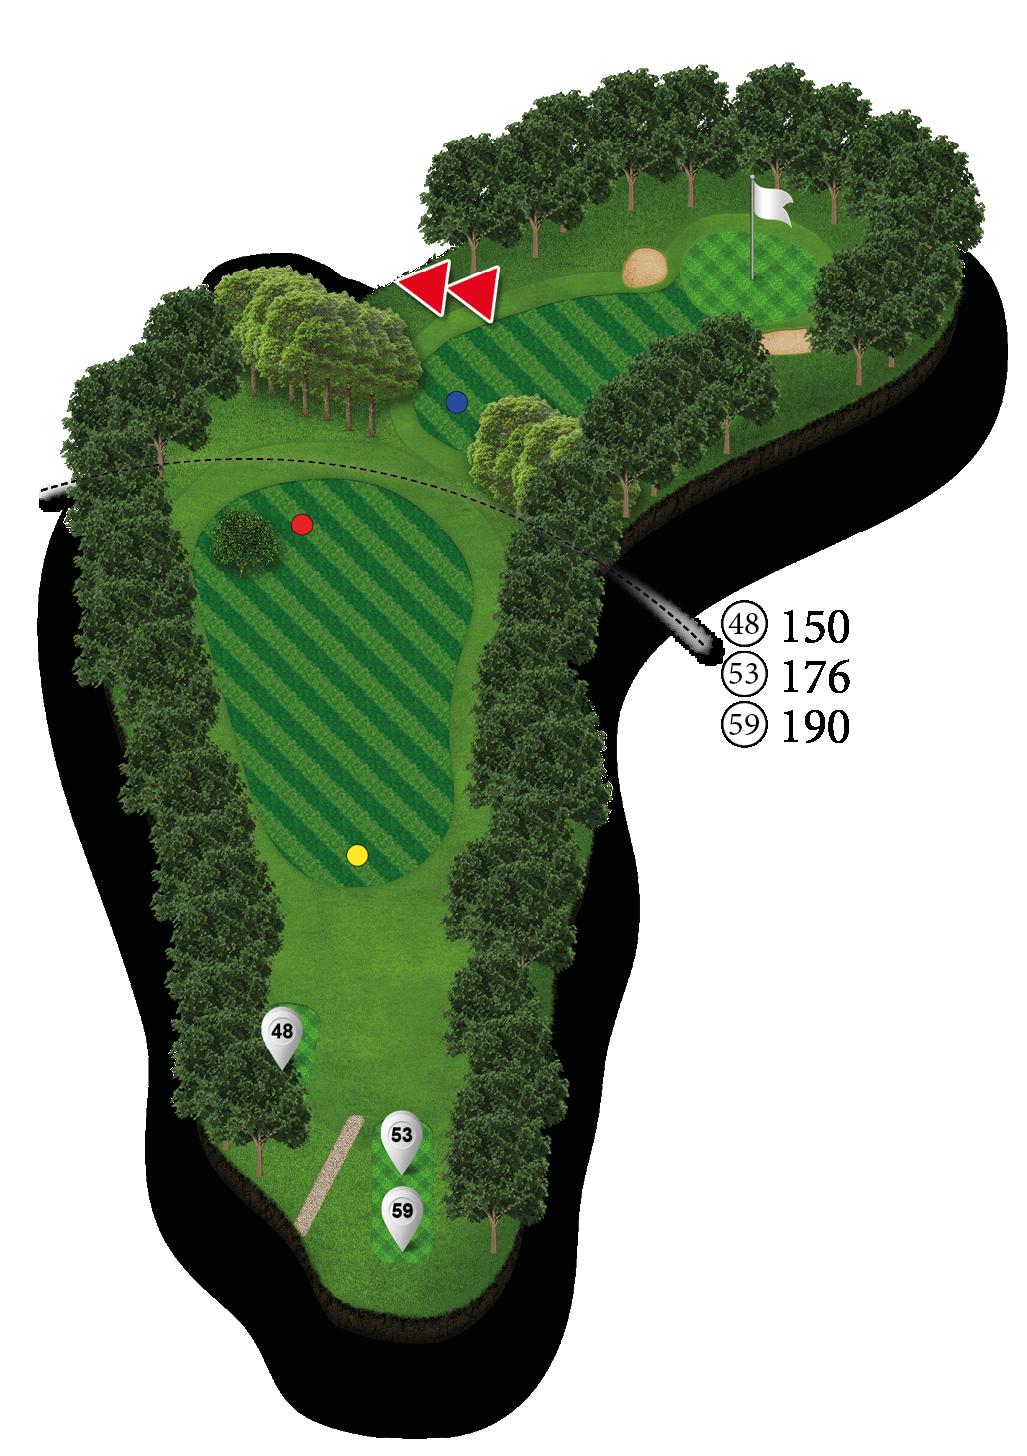 Baneguide Golfinfo